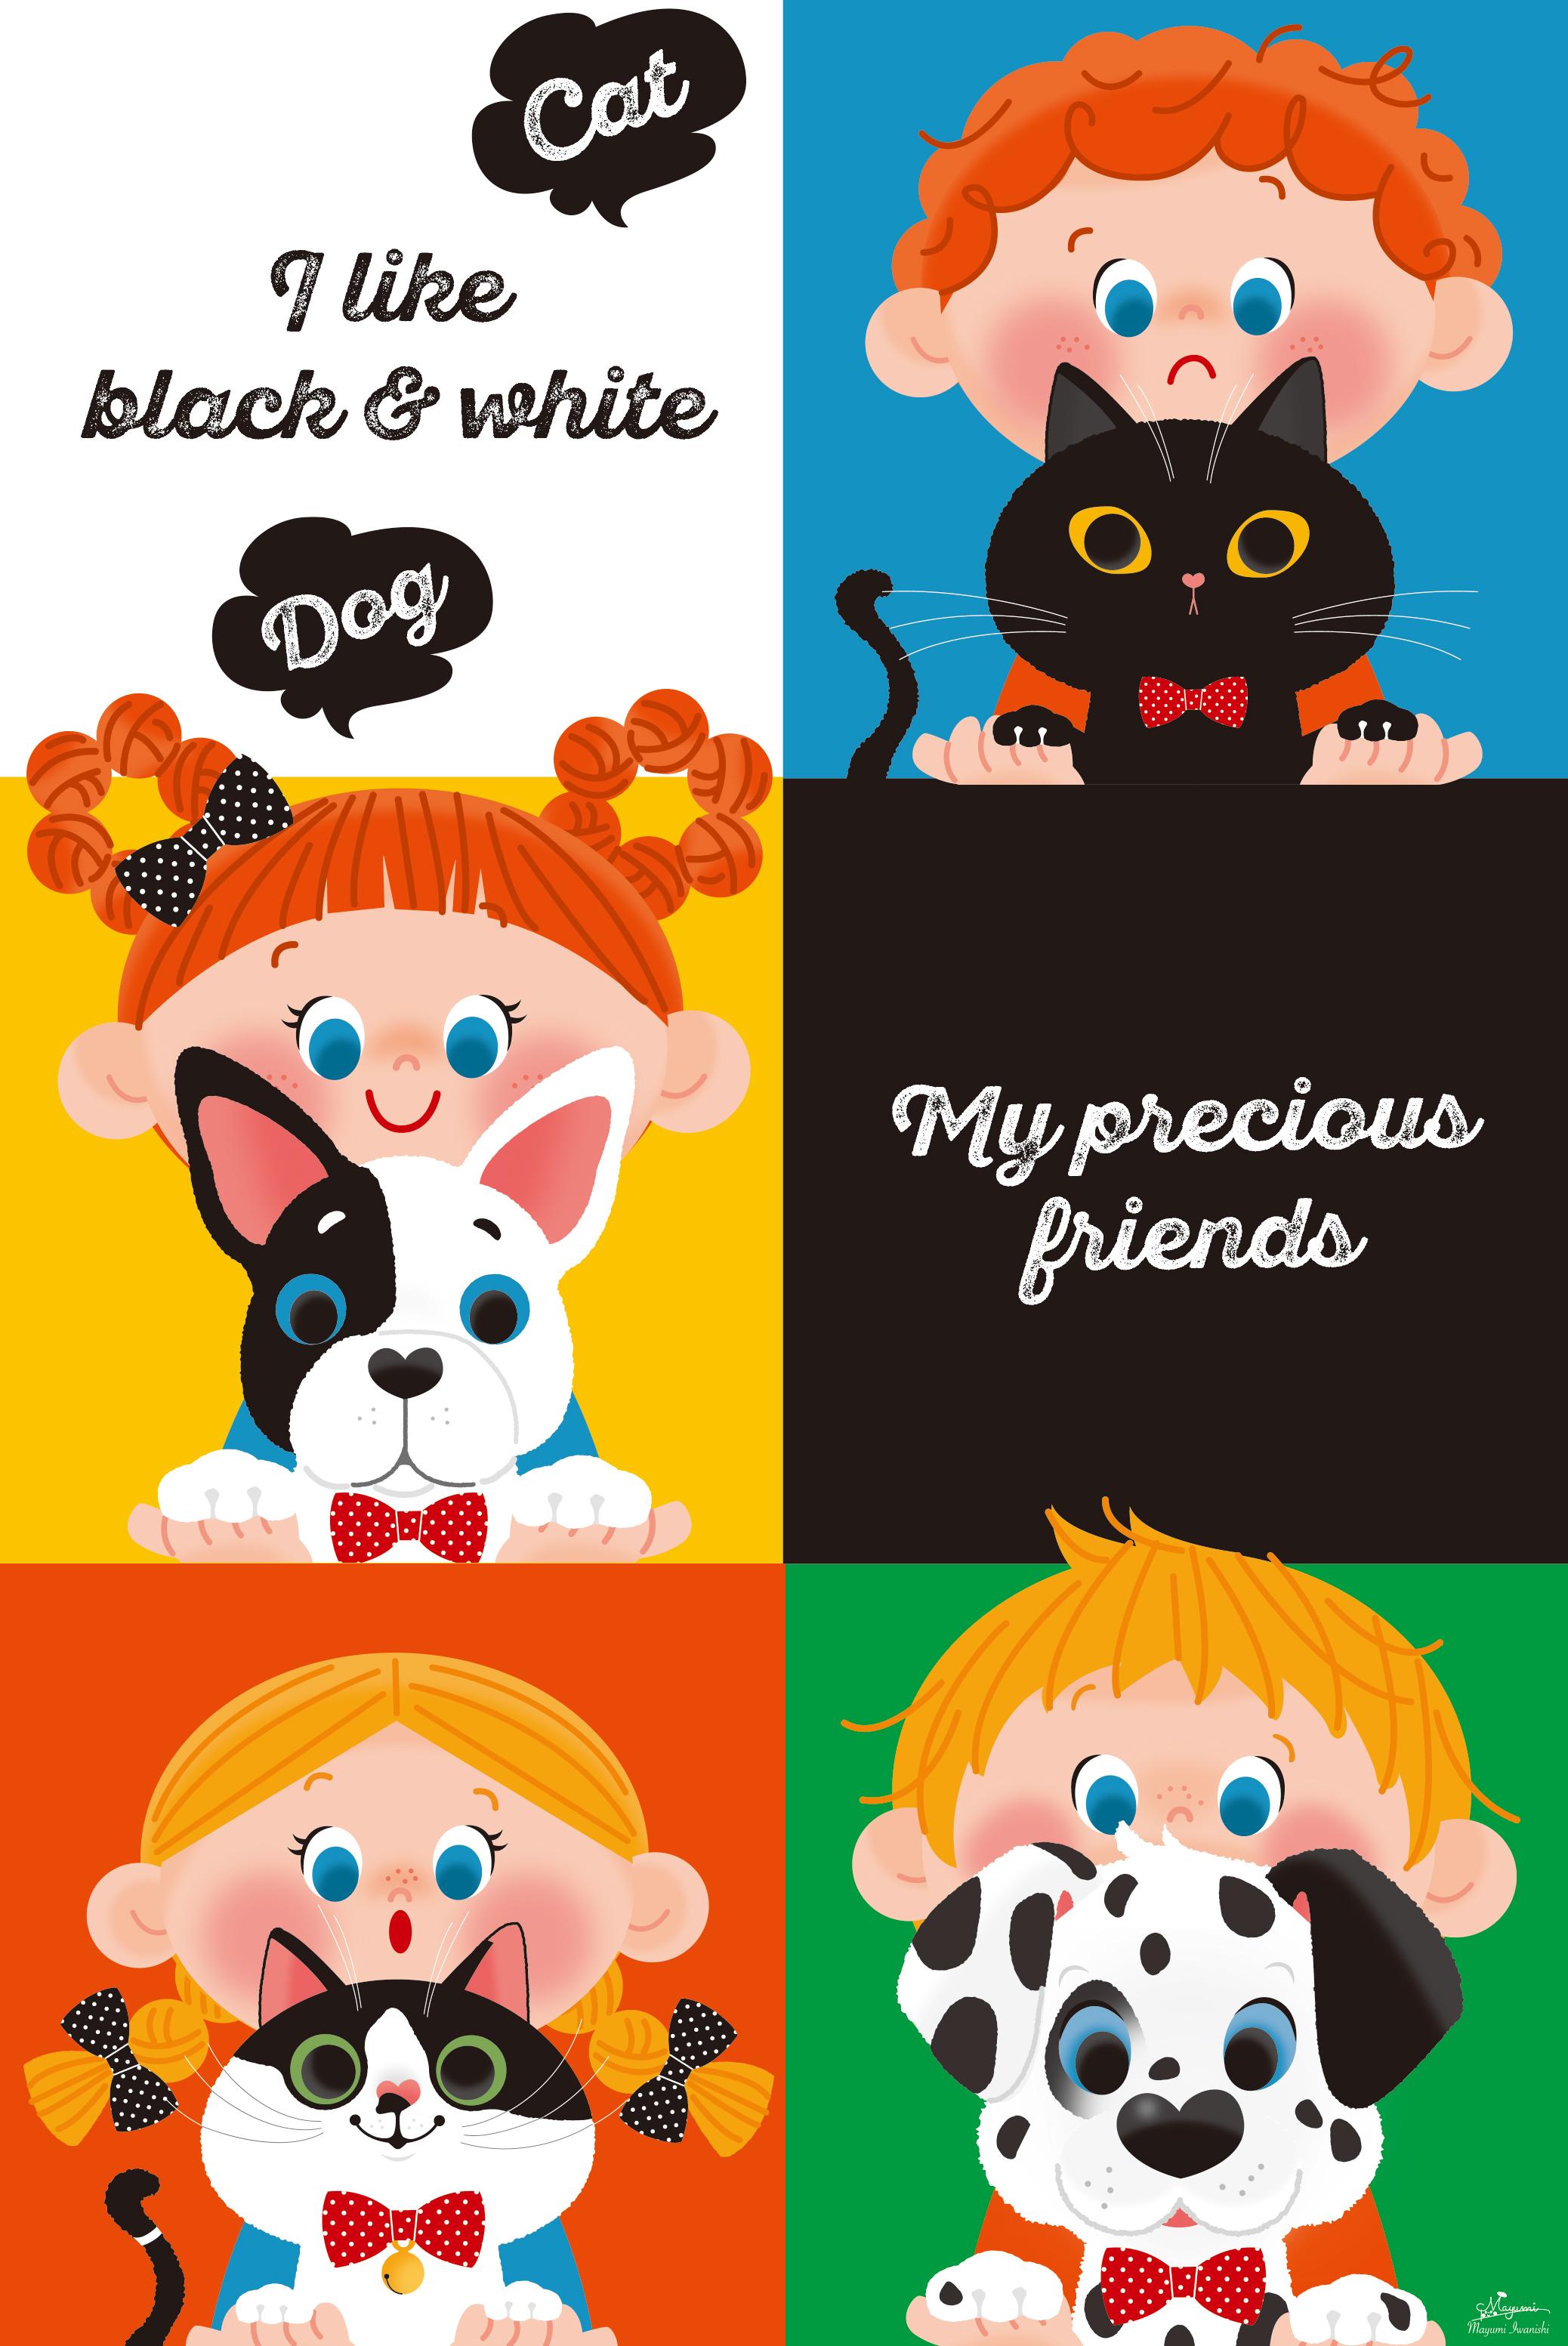 ILove Cat&Dog